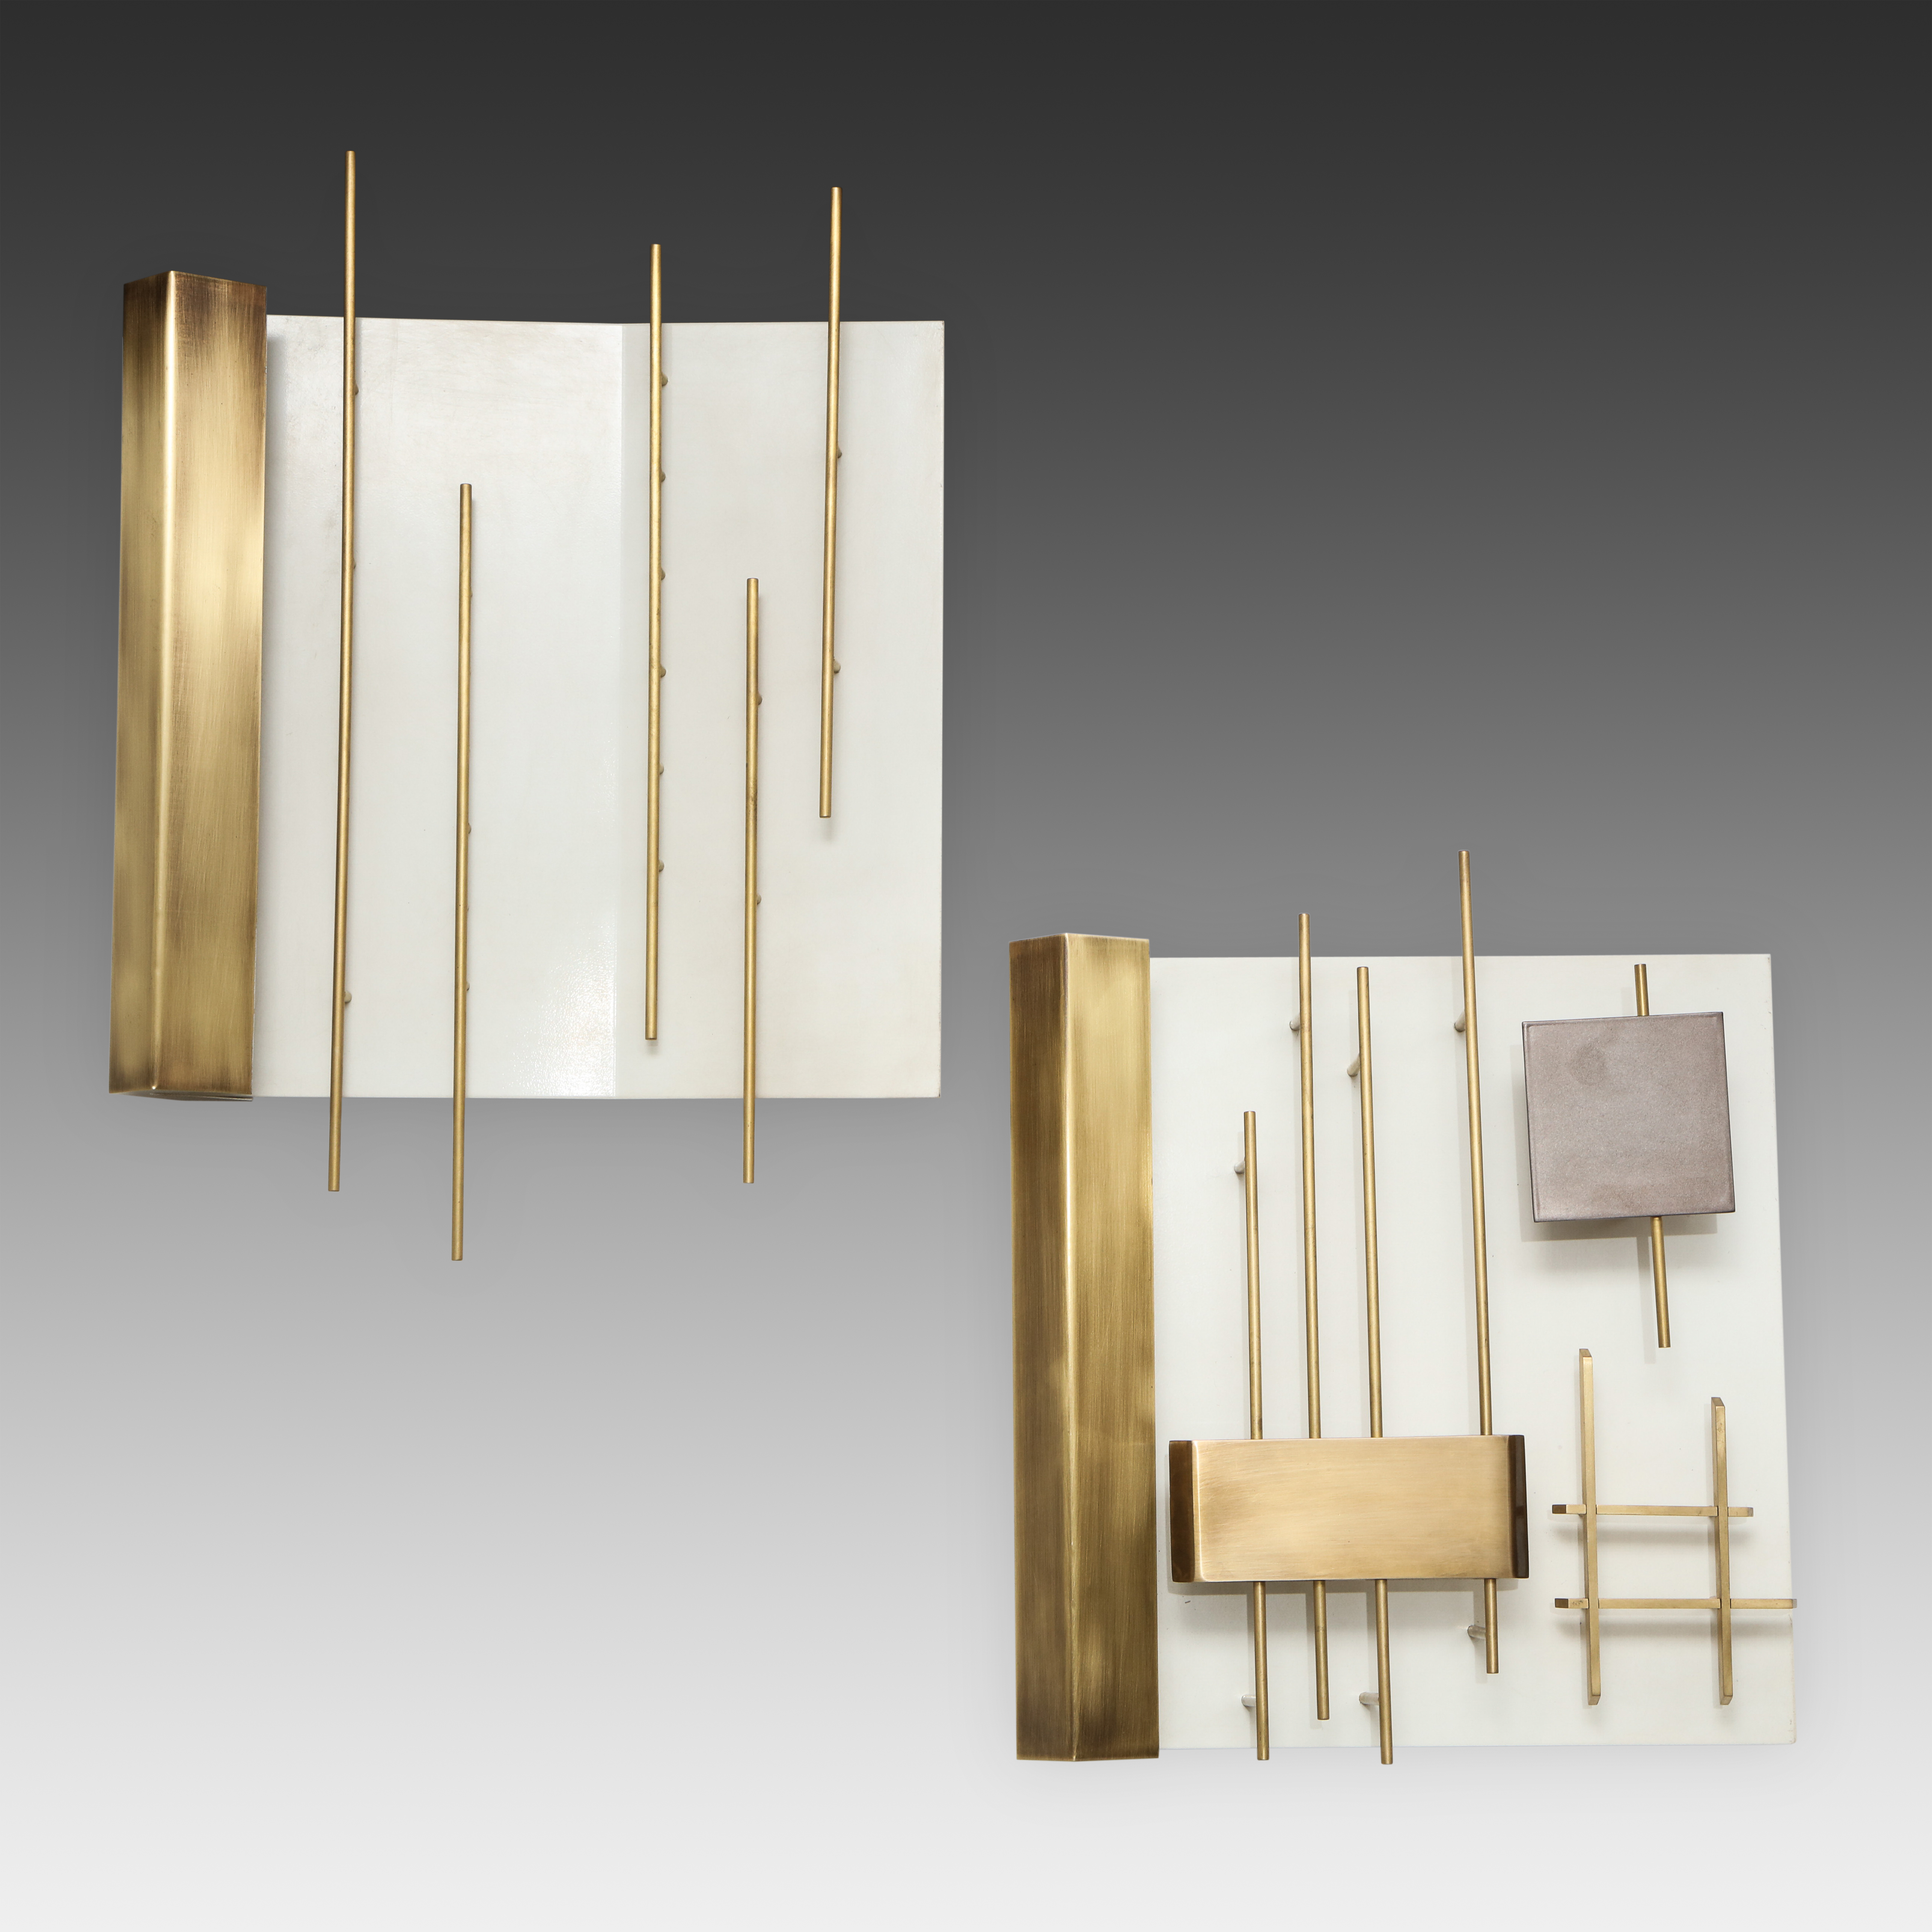 Pair of 'Quadri Luminosi' Sconces Models 575 & 576 by Gio Ponti for Lumi | soyun k.